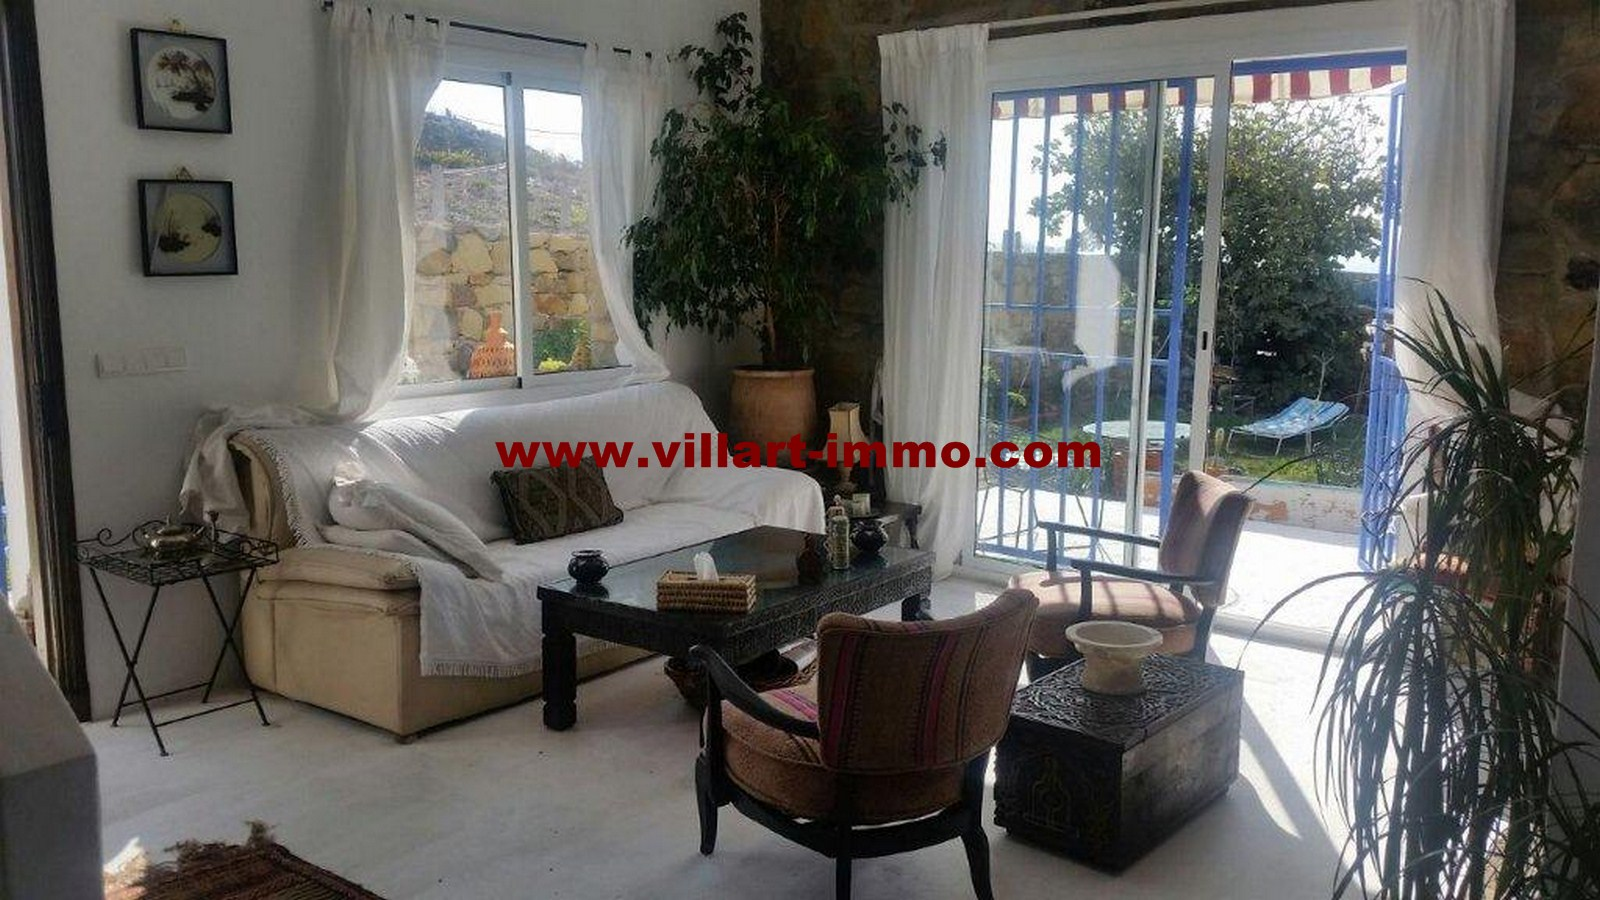 8-vente-villa-tanger-autres-salon-8-vv454-villart-immo